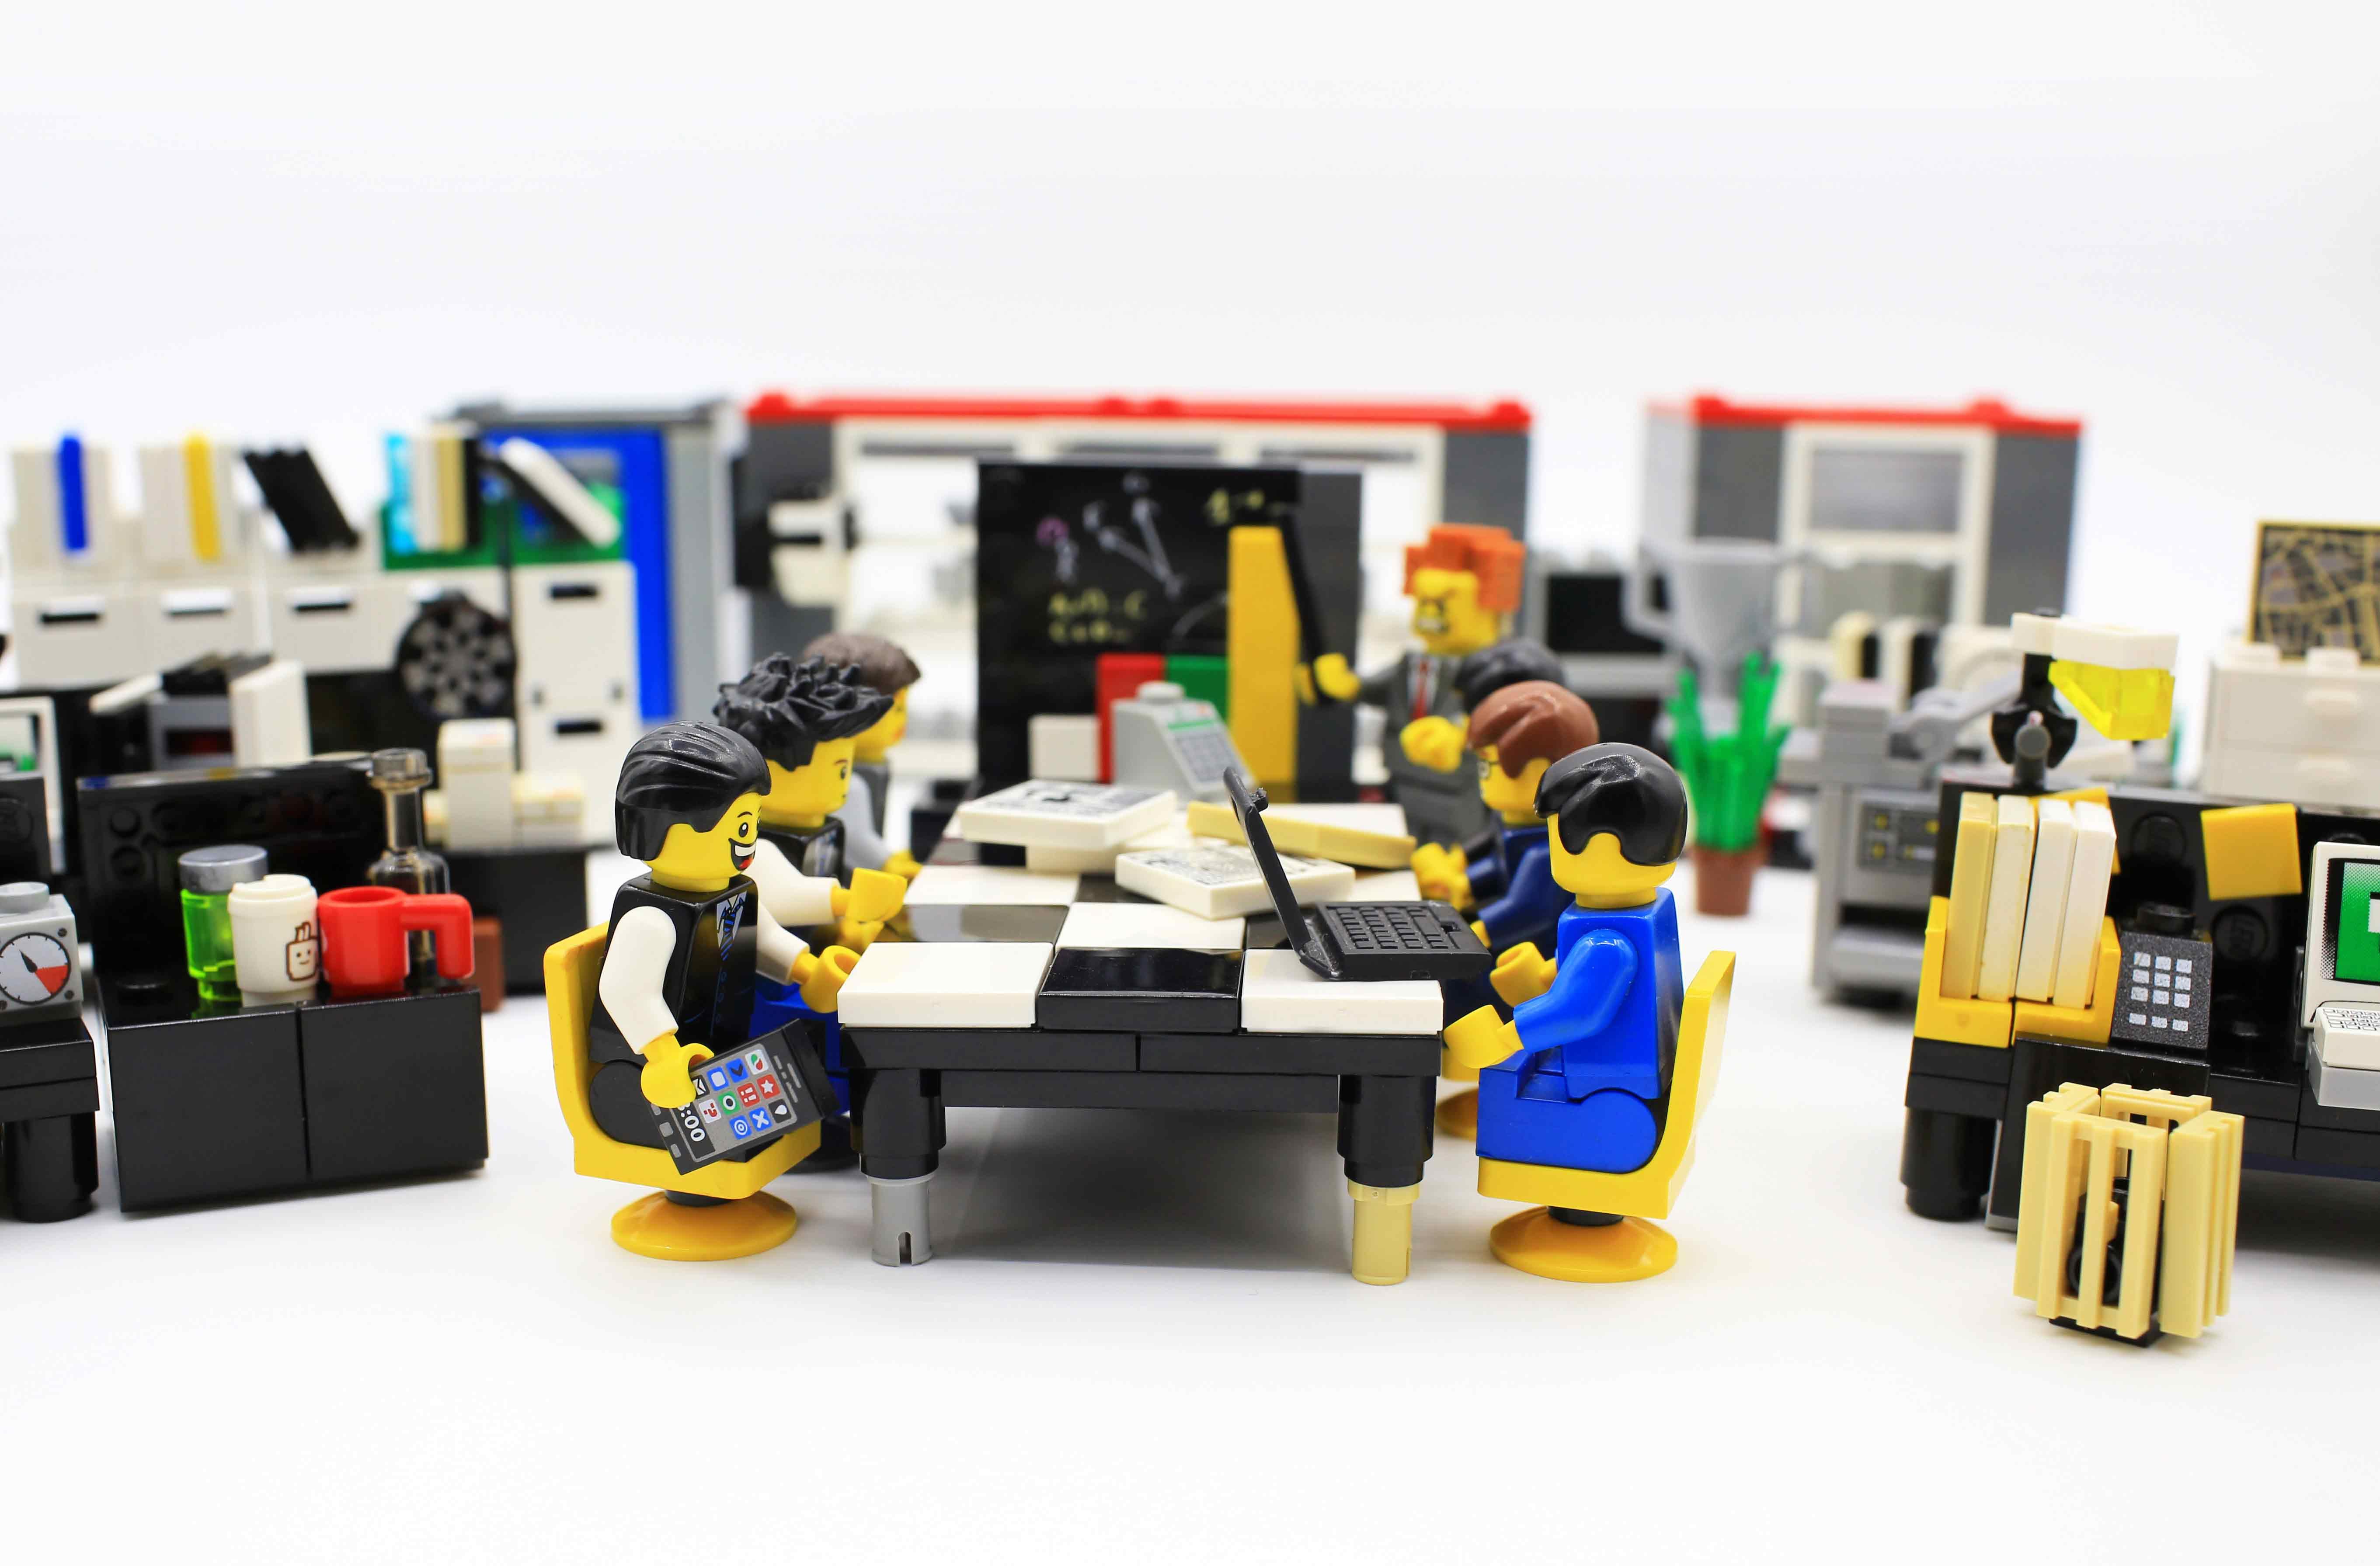 Conference Room Pilot Agenda